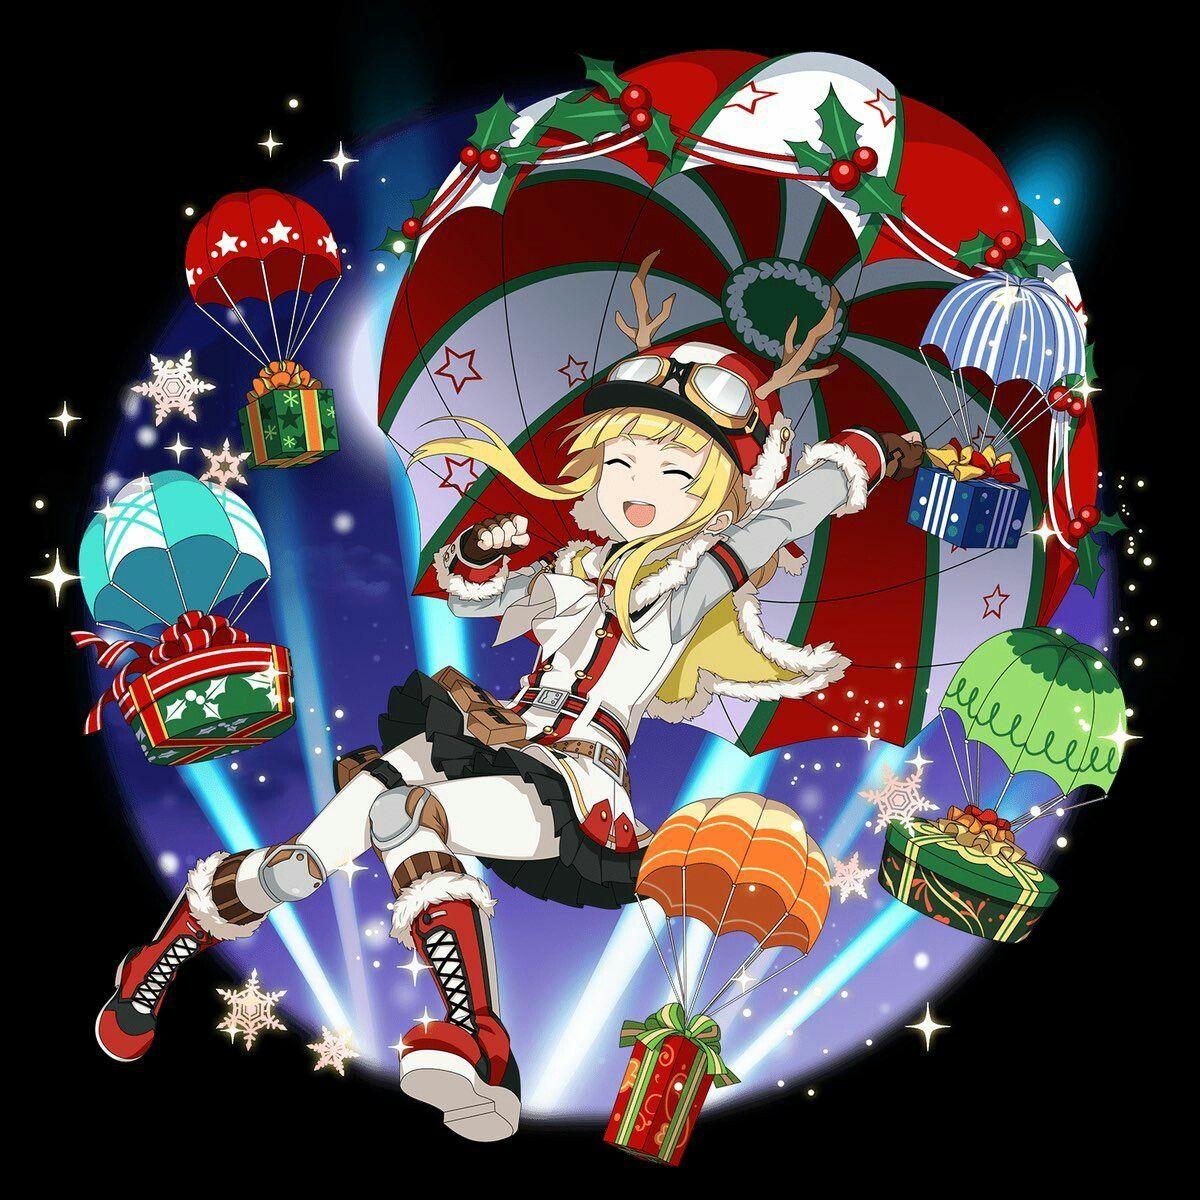 Pin by TokyoxGhoul on ソードアートオンライン Anime christmas, Sword